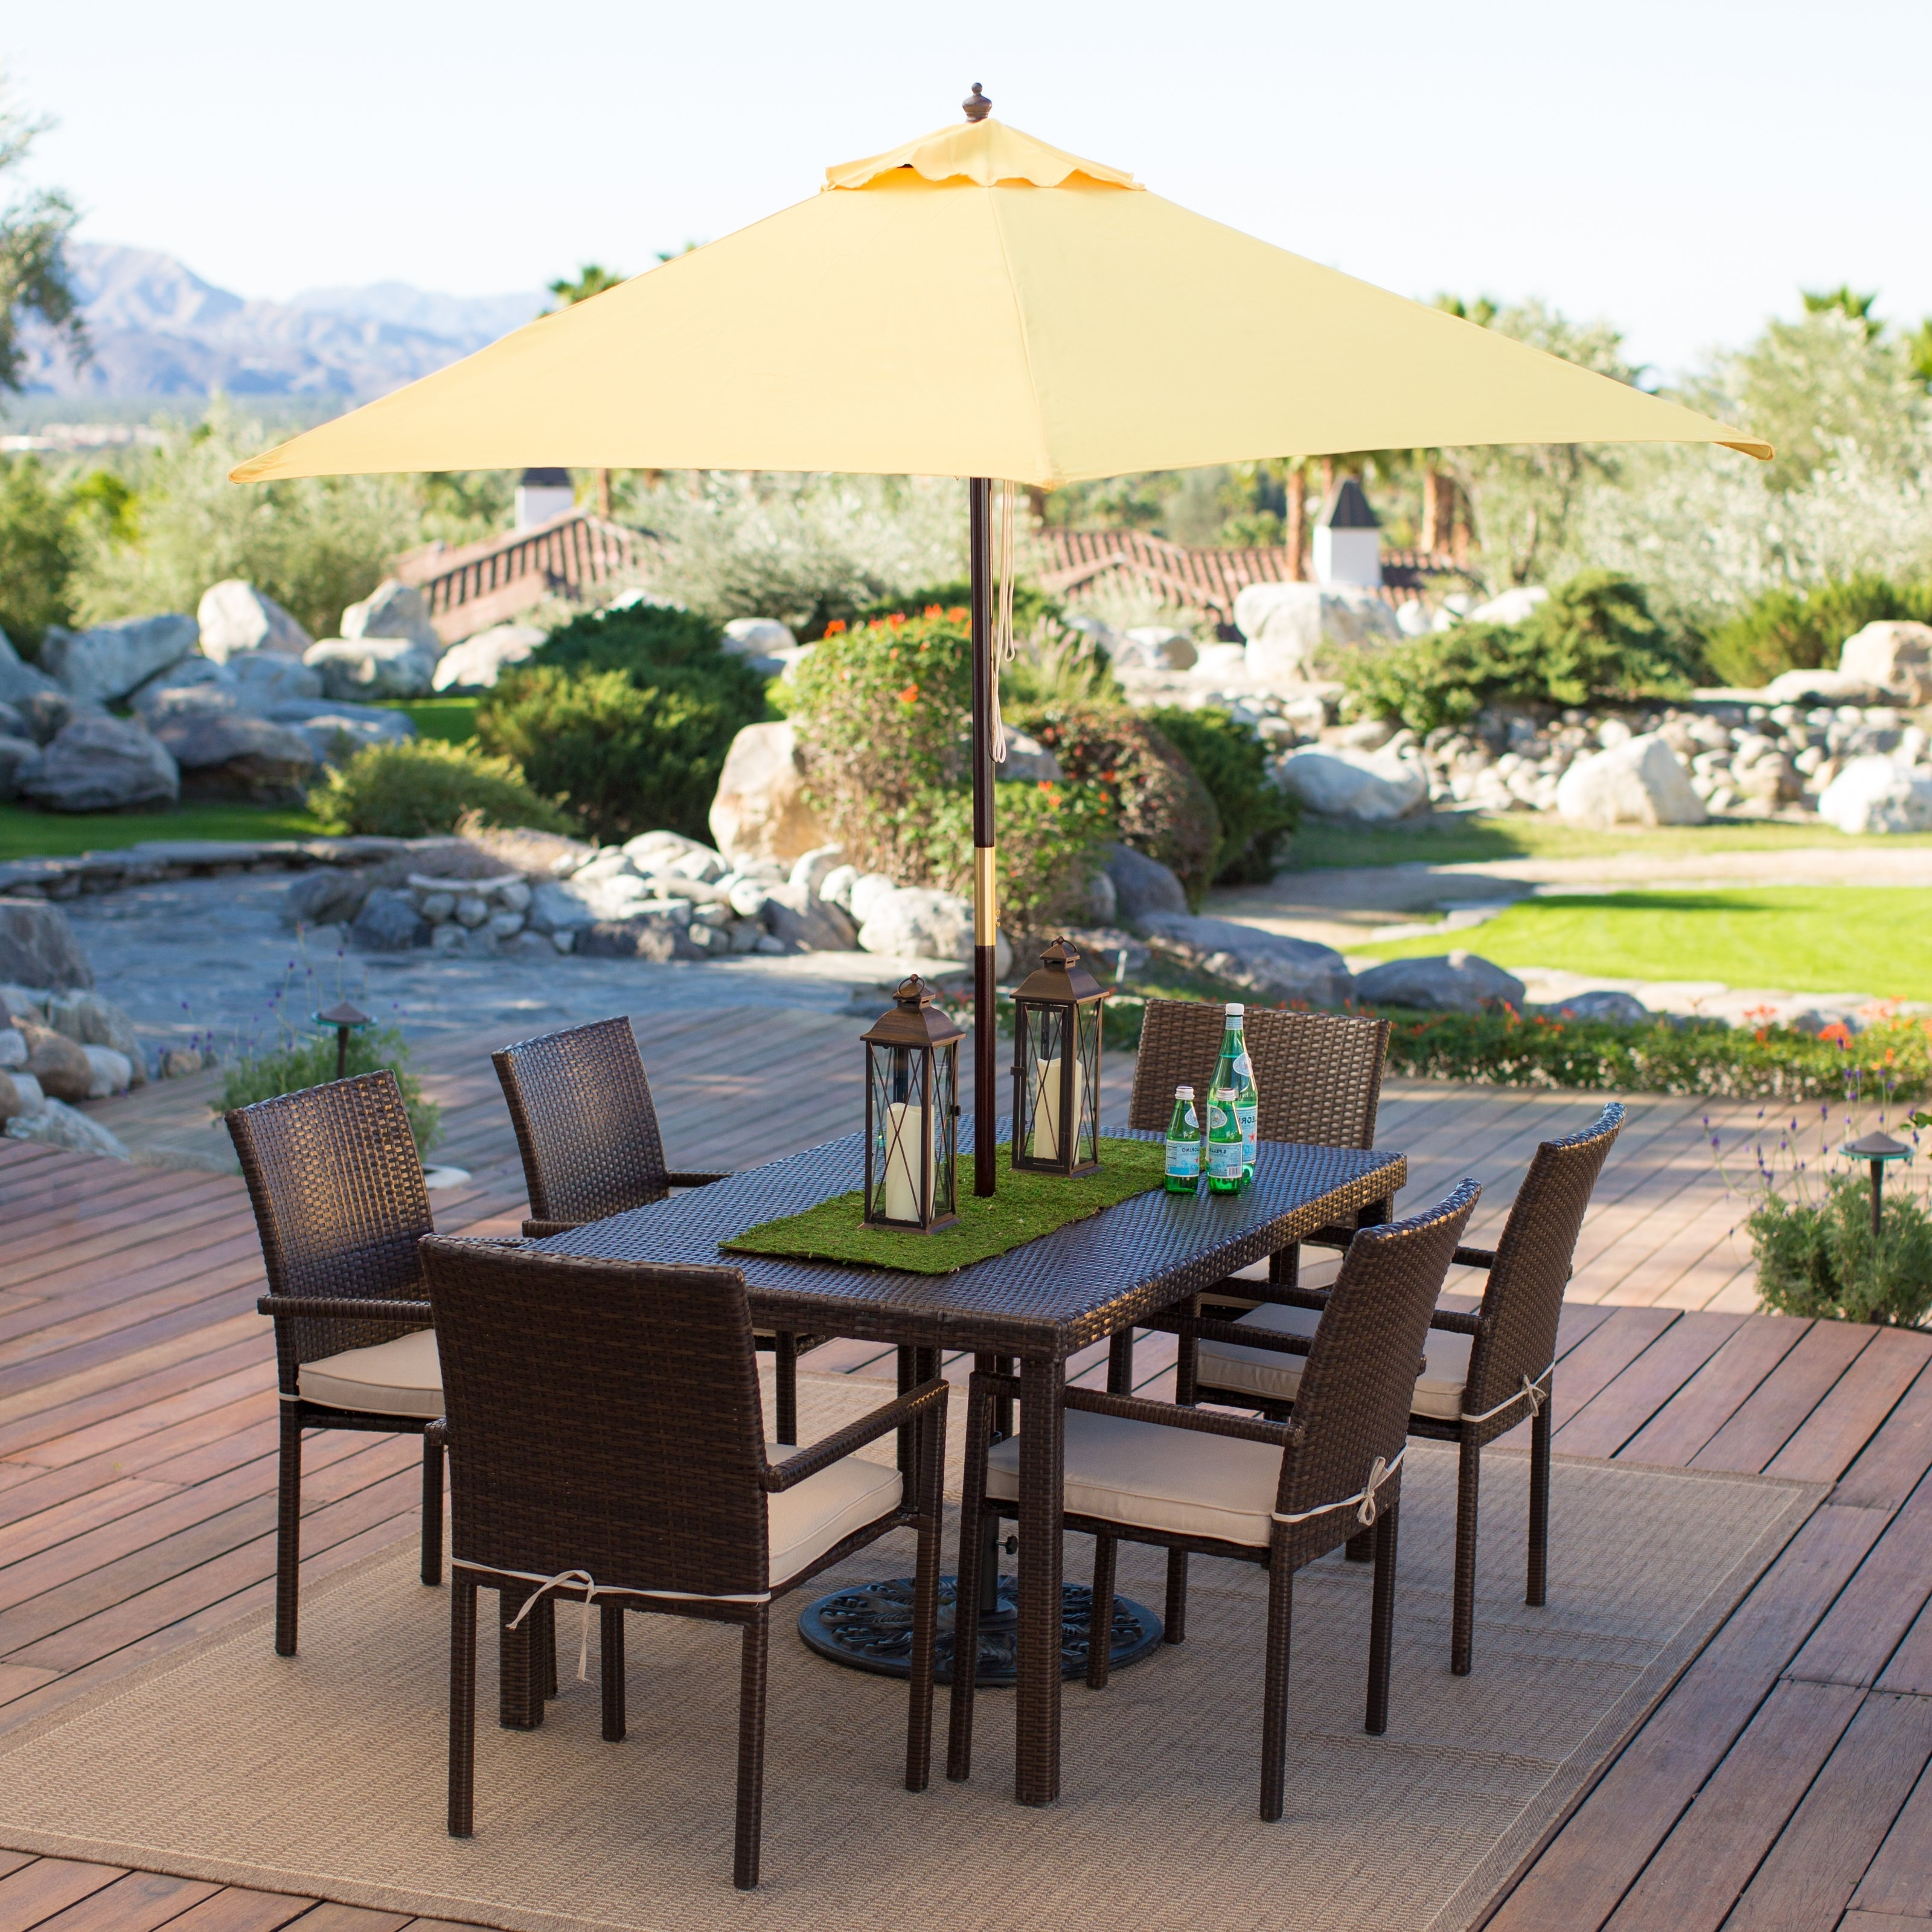 Garden: Enchanting Outdoor Patio Decor Ideas With Patio Umbrellas Pertaining To Preferred 6 Ft Patio Umbrellas (View 17 of 20)